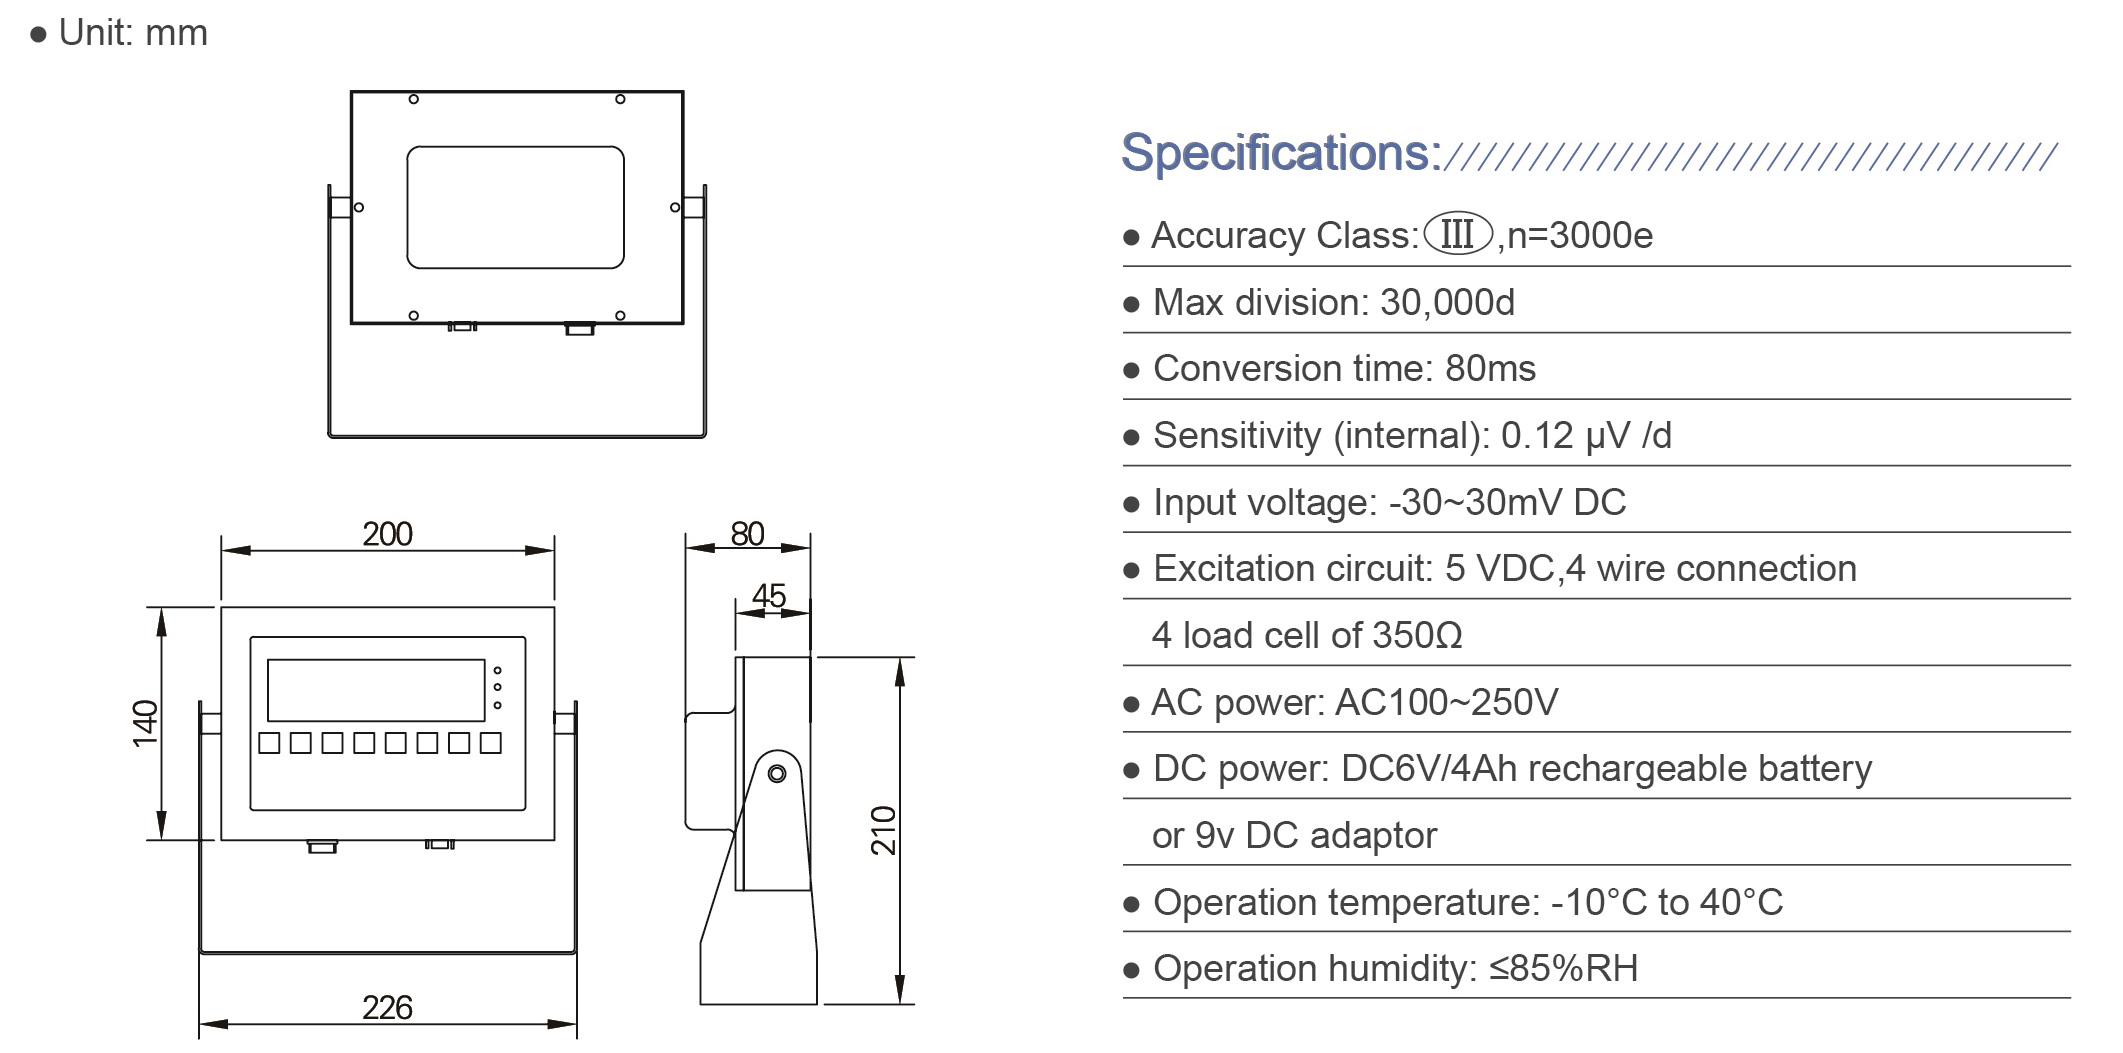 Lp7510 Digital Weighing Indicator Buy 250vdc Wiring Diagram Specification